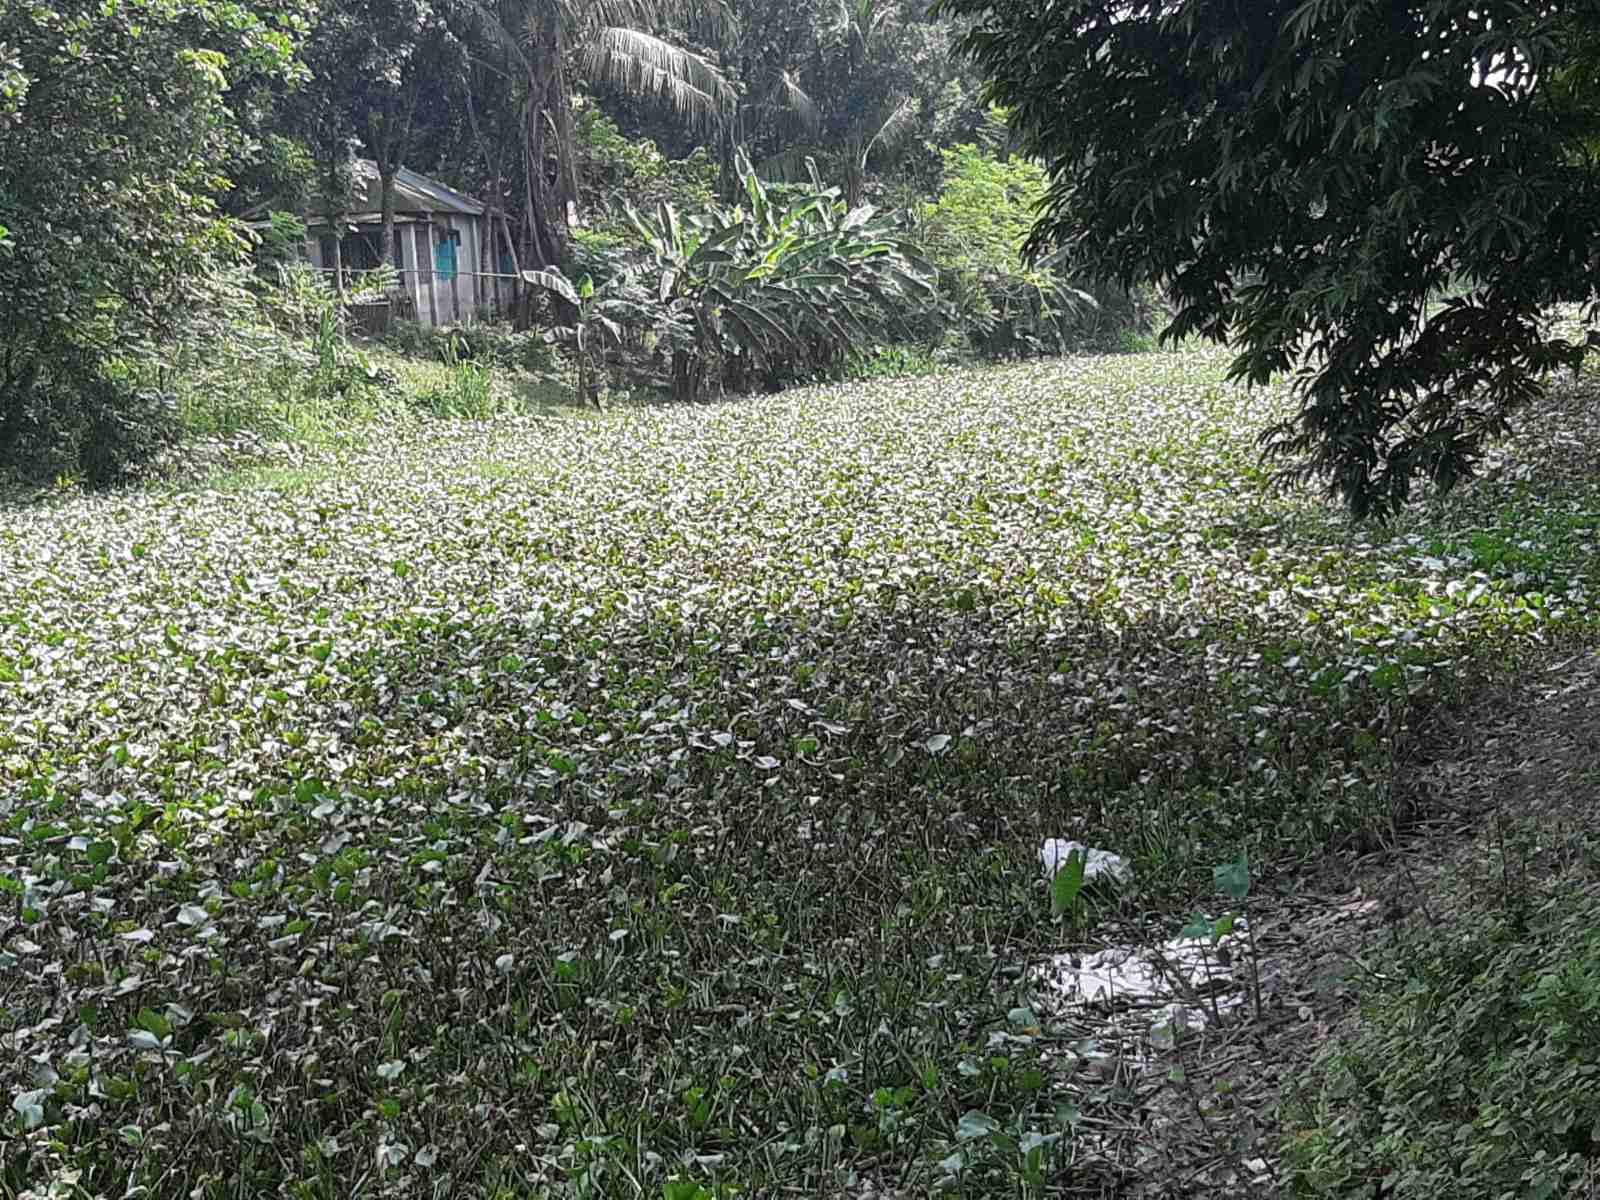 Ichamati-River-Cleaning-Pabna-Bangladesh-October-2020-1.jpg